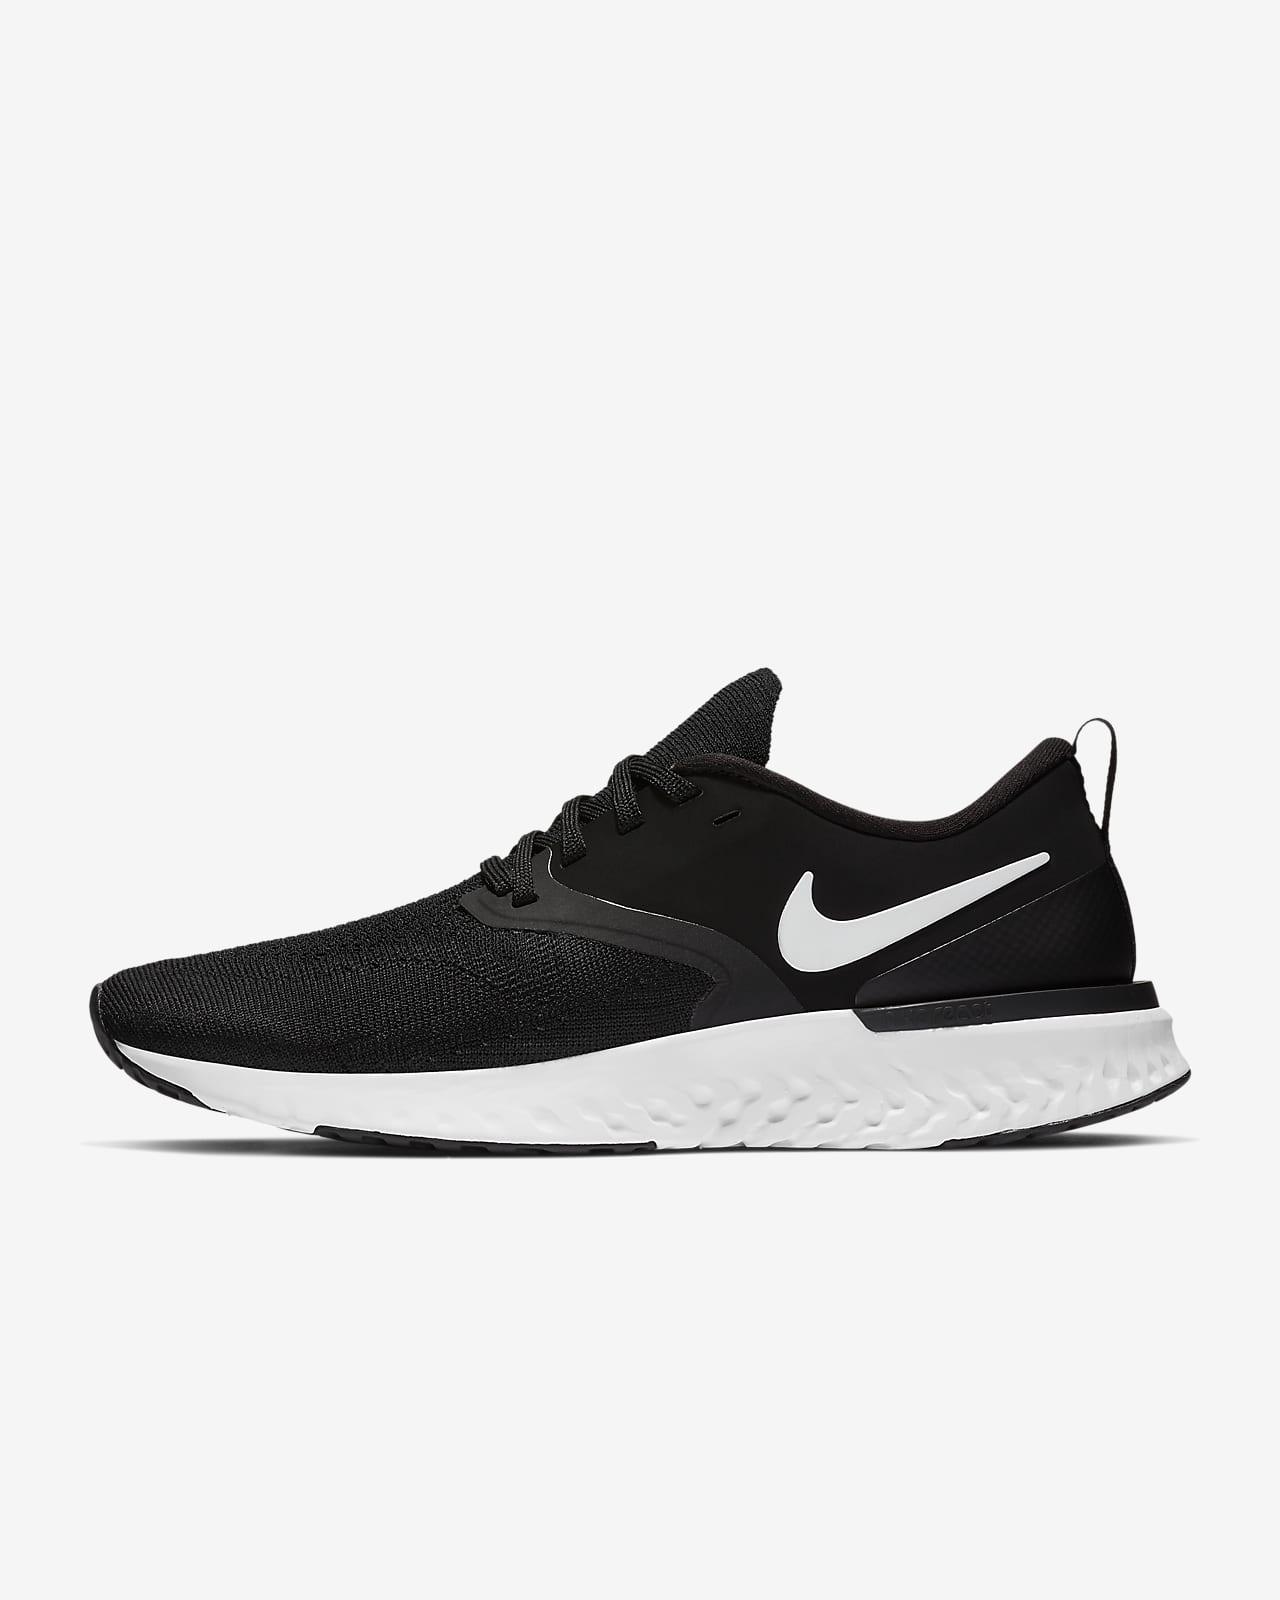 Nike Odyssey React Flyknit 2 Damen-Laufschuh